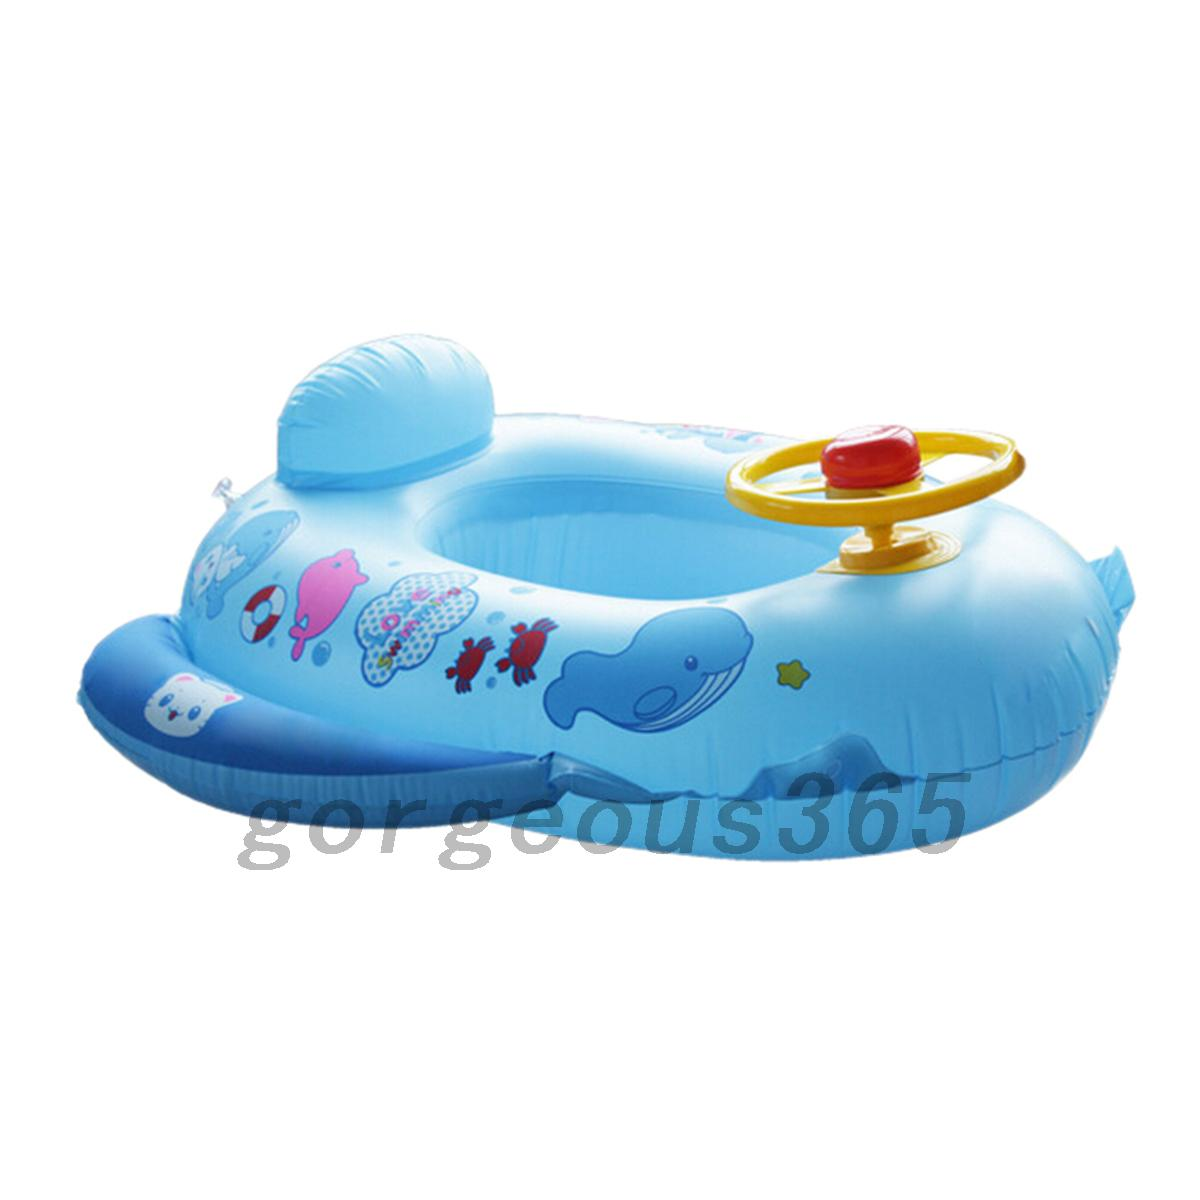 Wheel Horn Inflatable Kids Baby Pool Swim Ring Seat Float Boat Swimming Aid Ebay